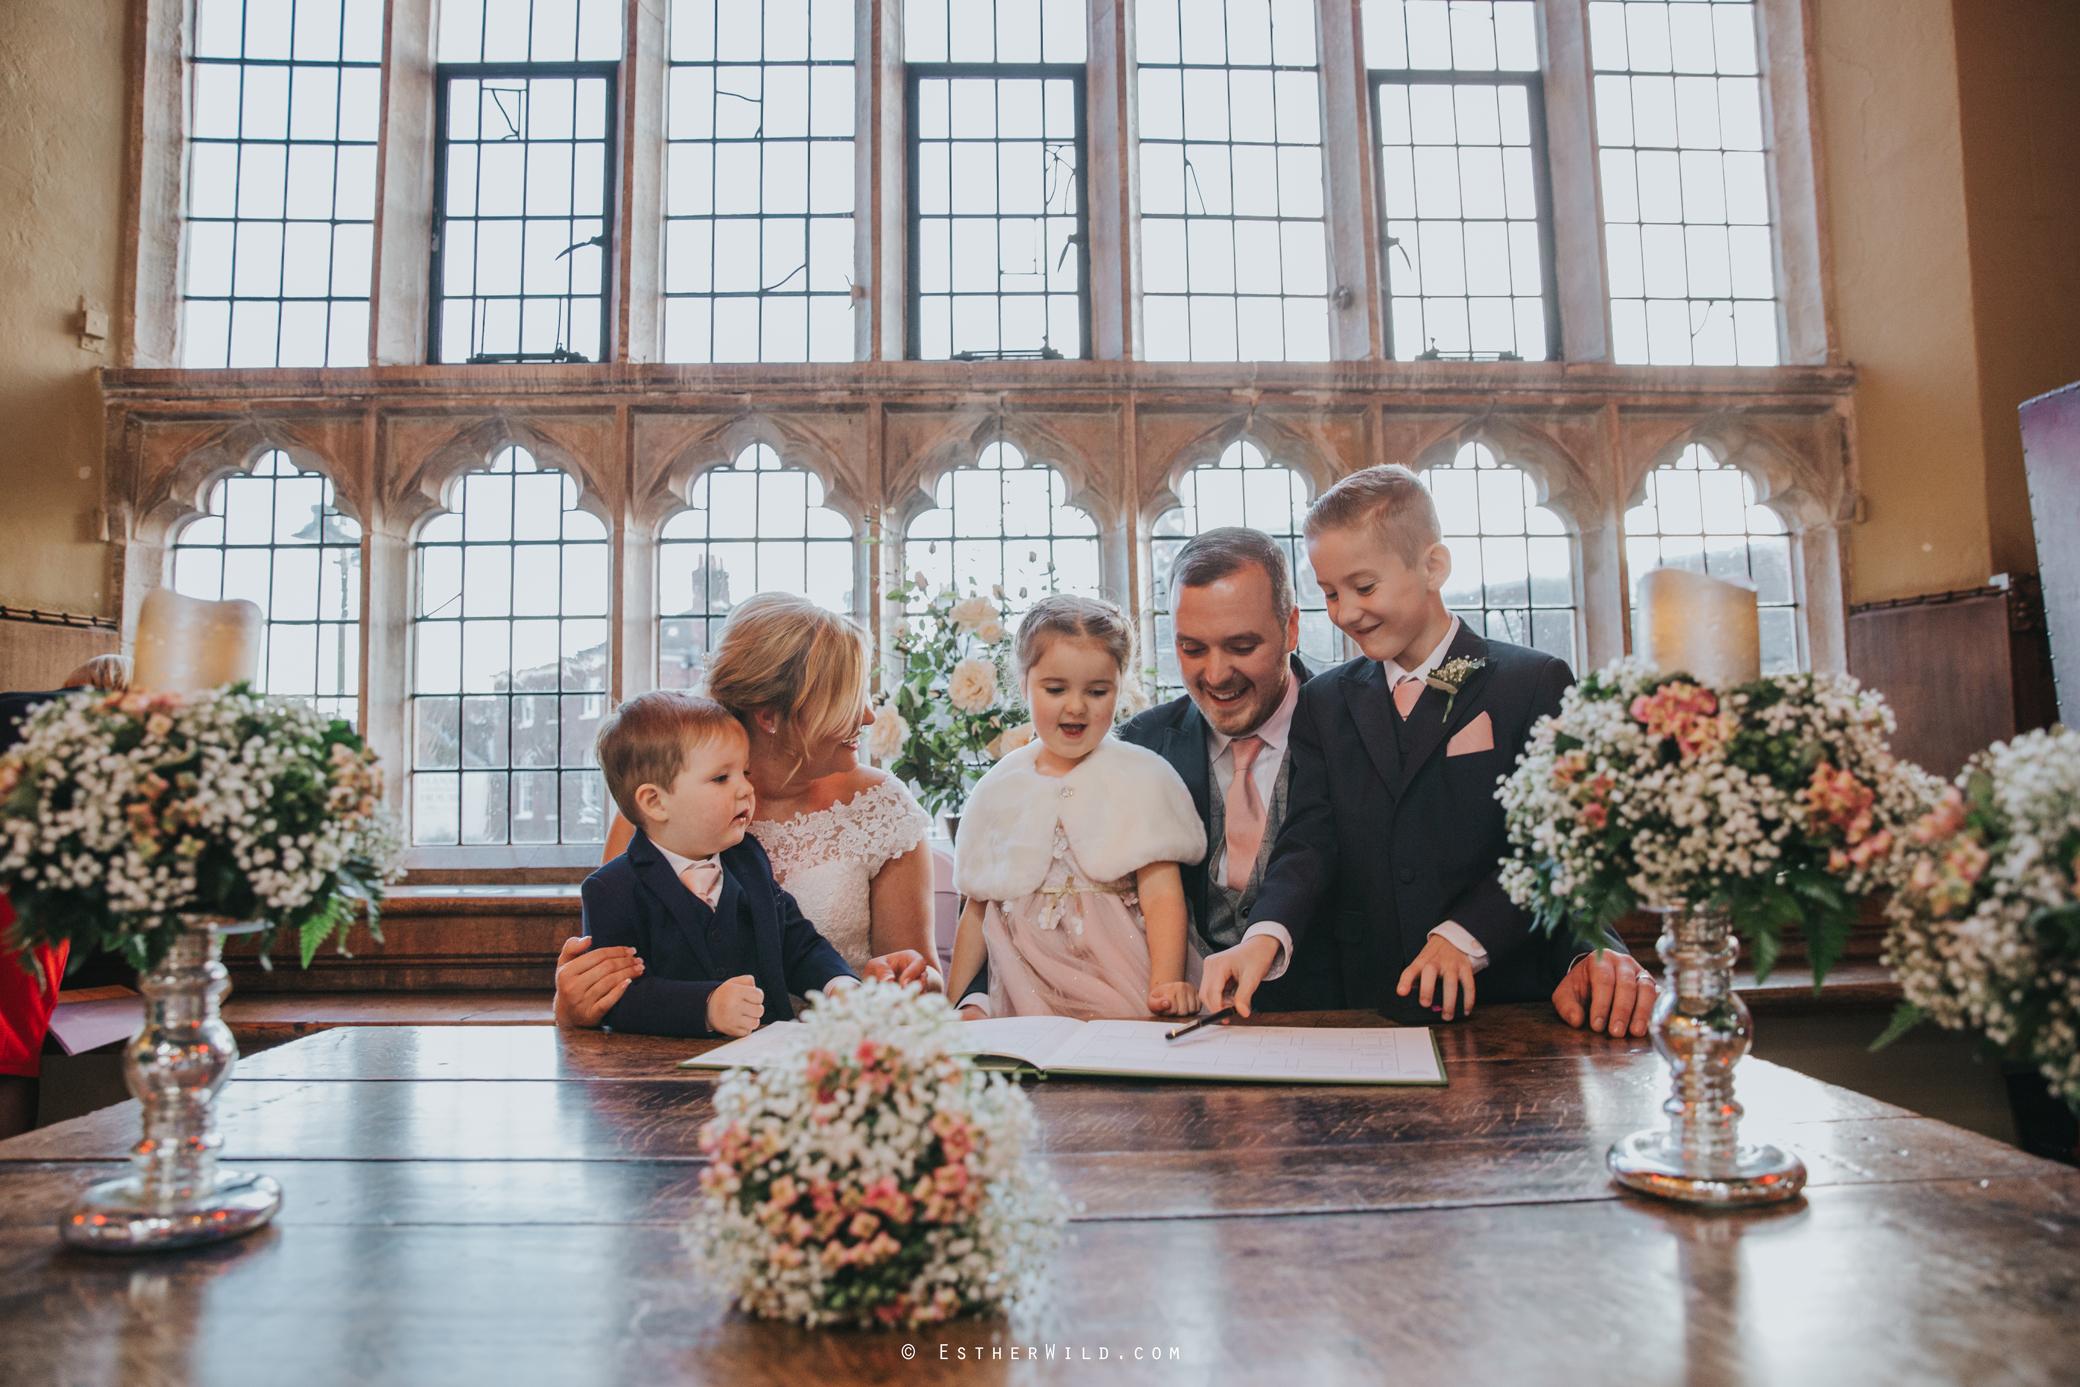 Wedding_Kings_Lynn_Town_Hall_Norfolk_Photographer_Esther_Wild_IMG_1116.jpg